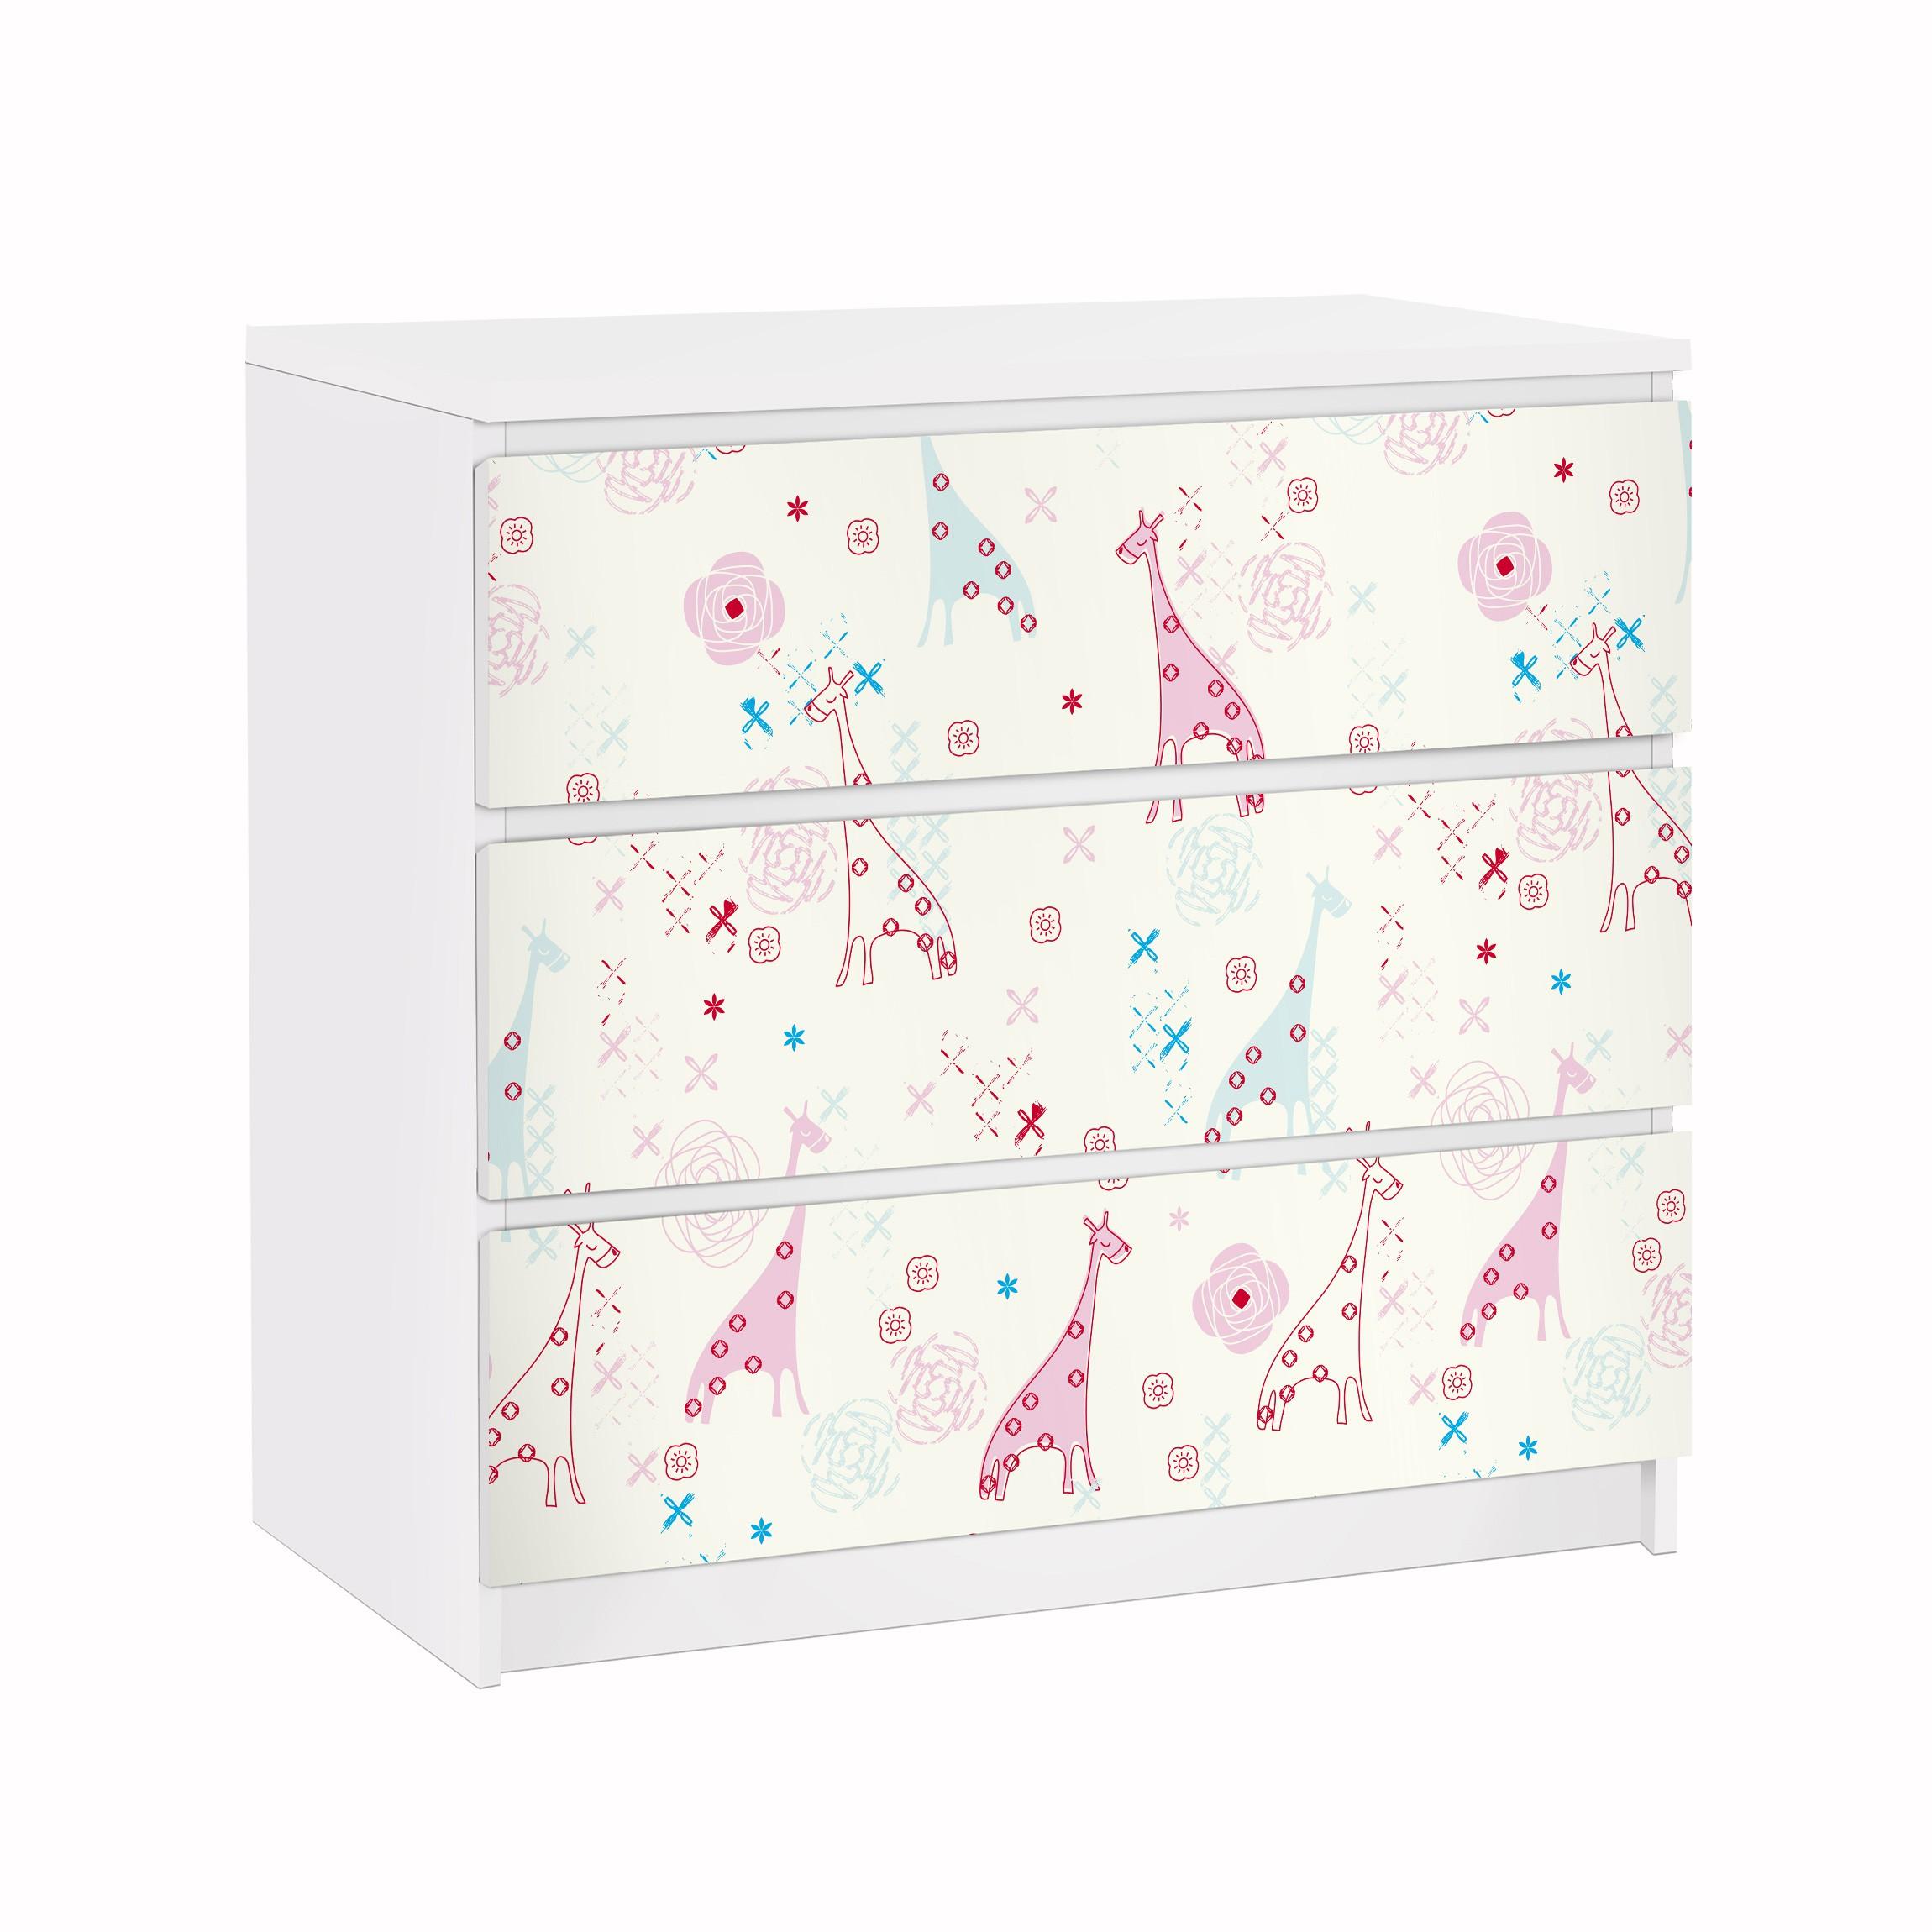 Furniture decal for ikea malm dresser 3xdrawers for Carta adesiva per mobili ikea